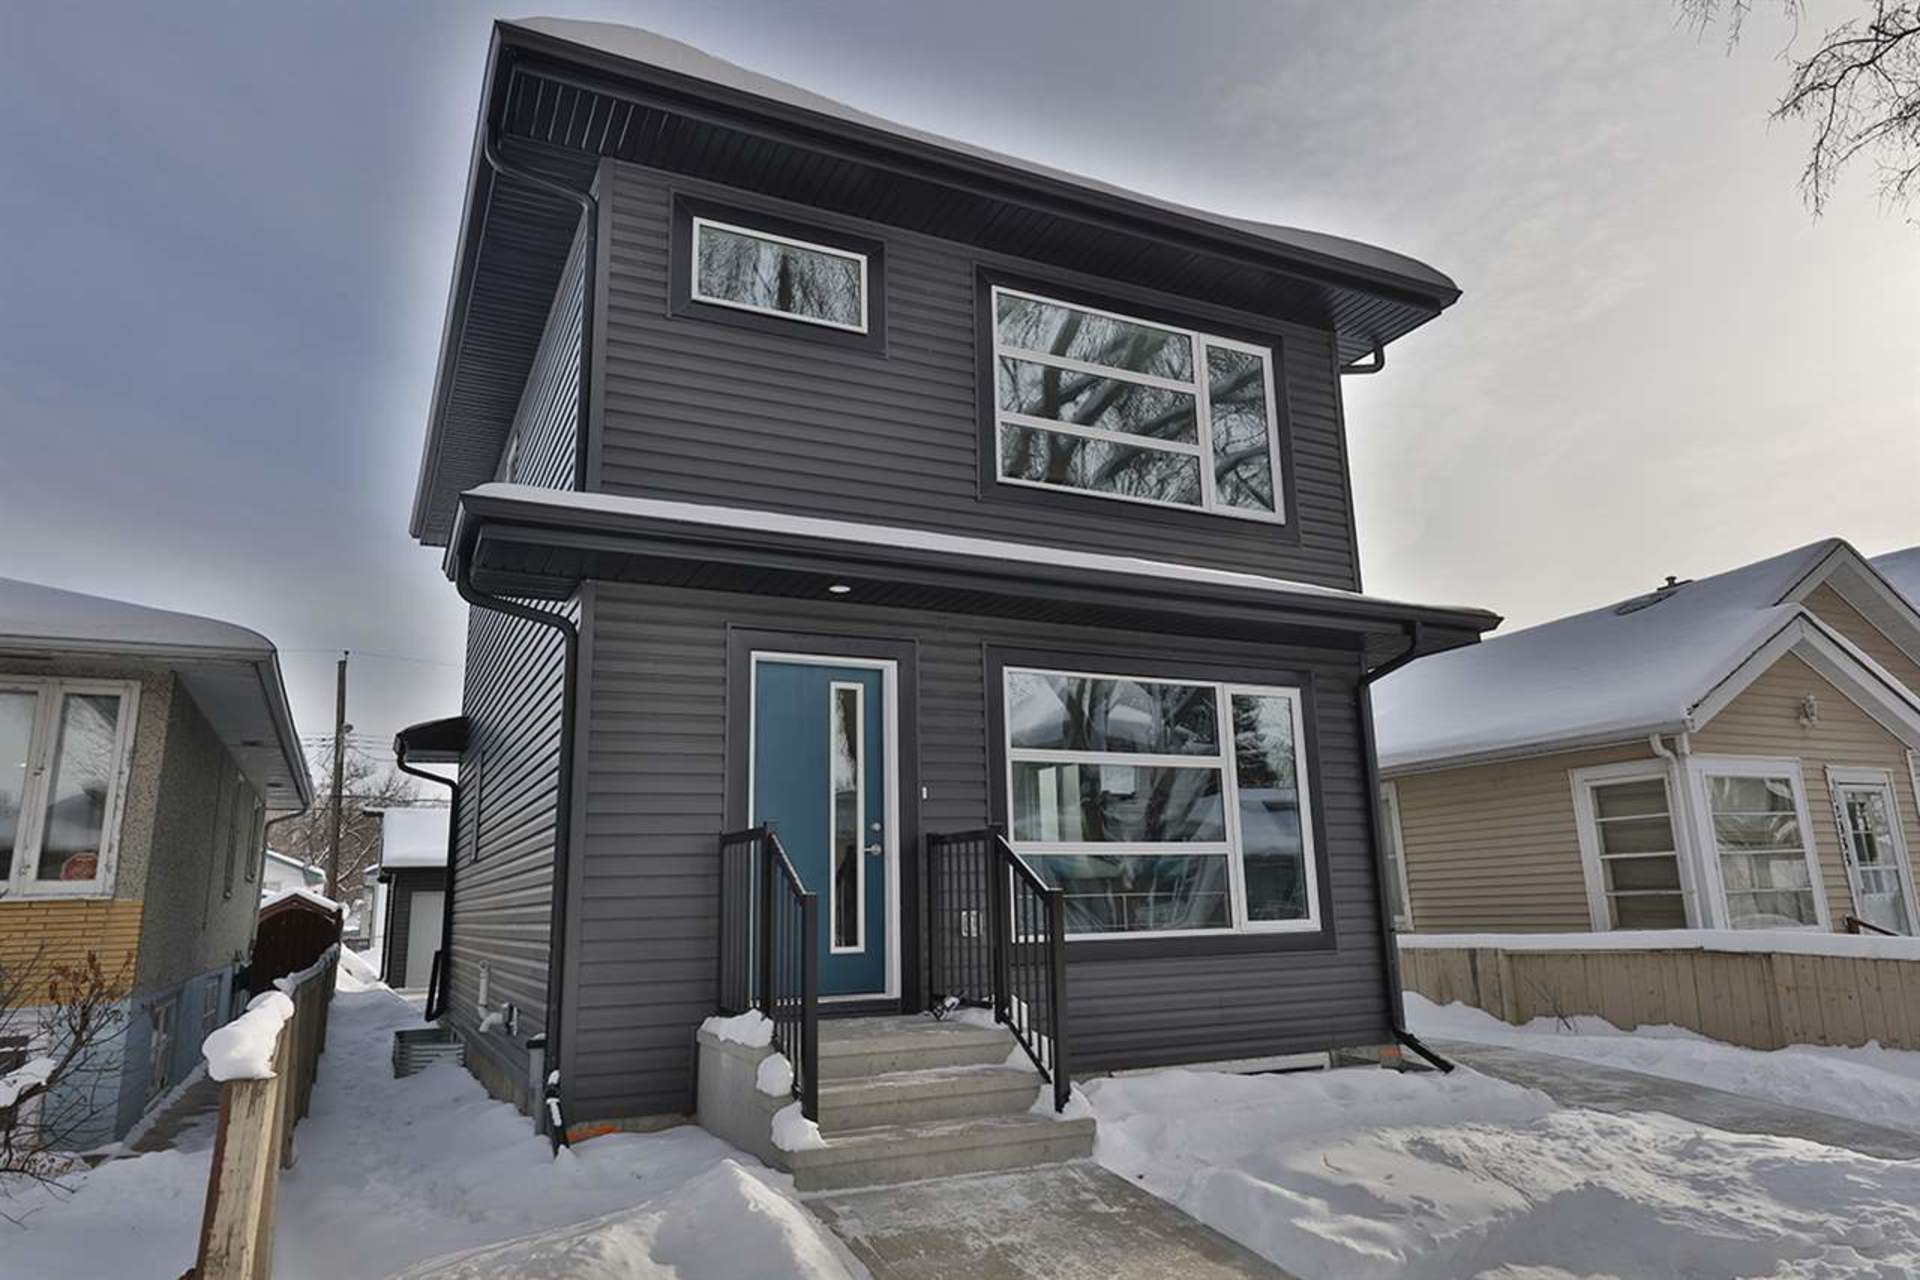 12037-93-street-alberta-avenue-edmonton-01 at 12037 93 Street, Alberta Avenue, Edmonton